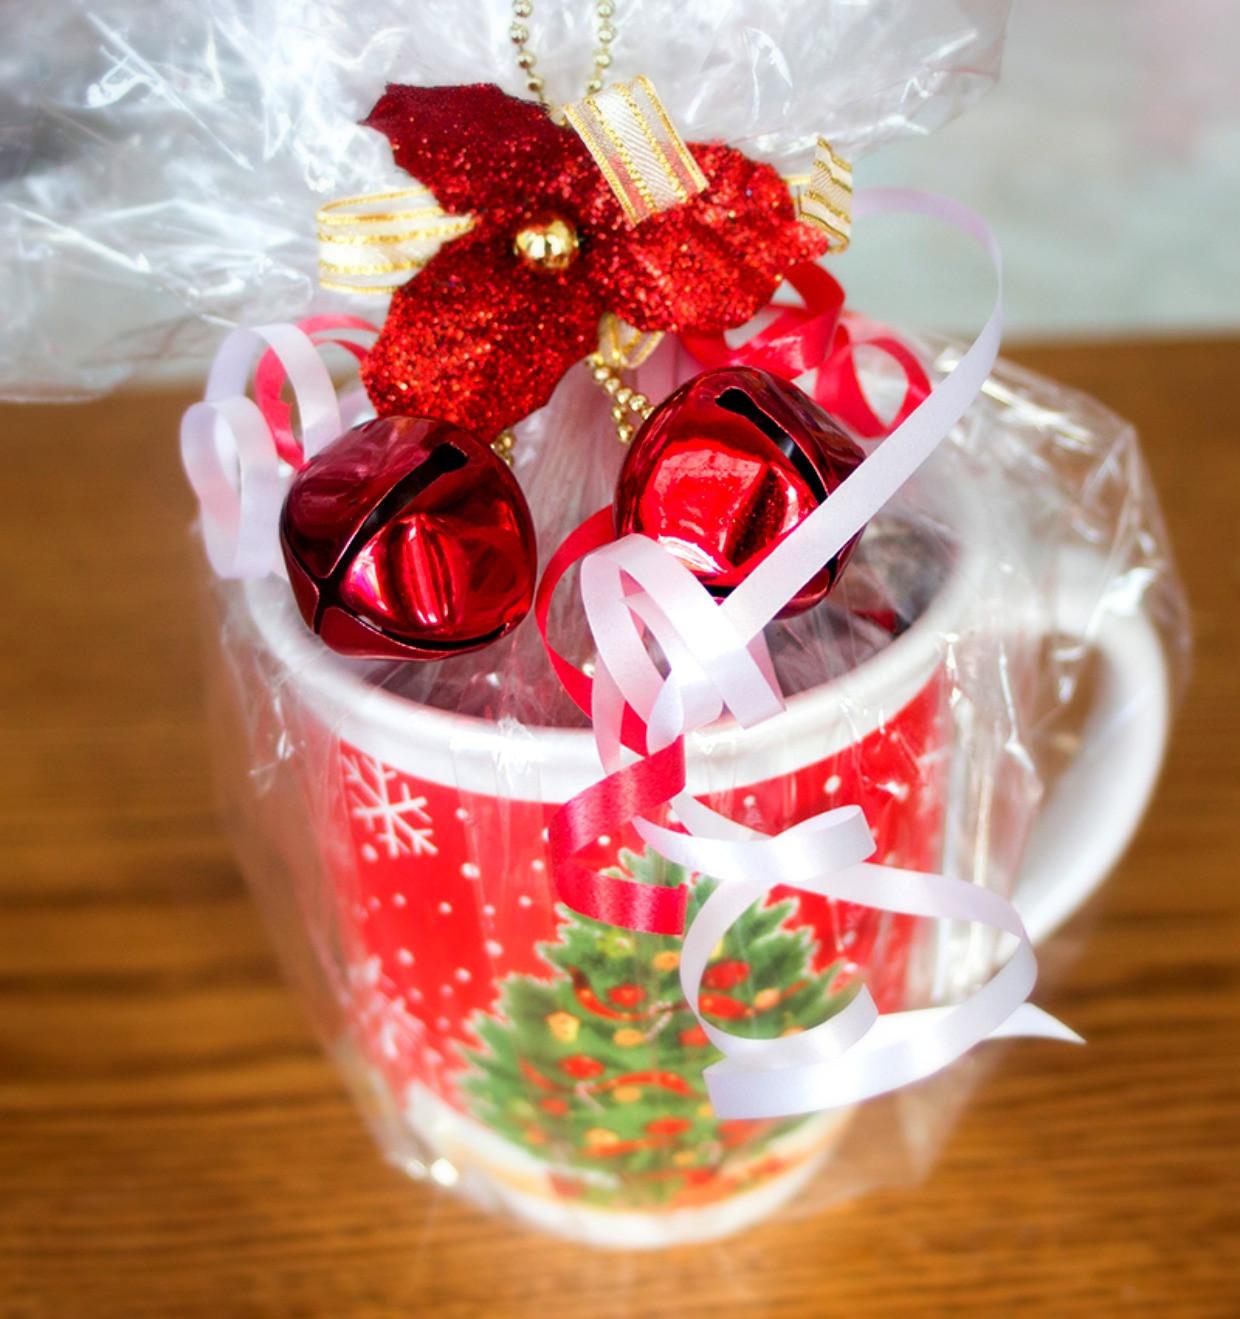 Christmas Mug Gift Ideas  Cake in a Mug DIY Holiday Gift Idea